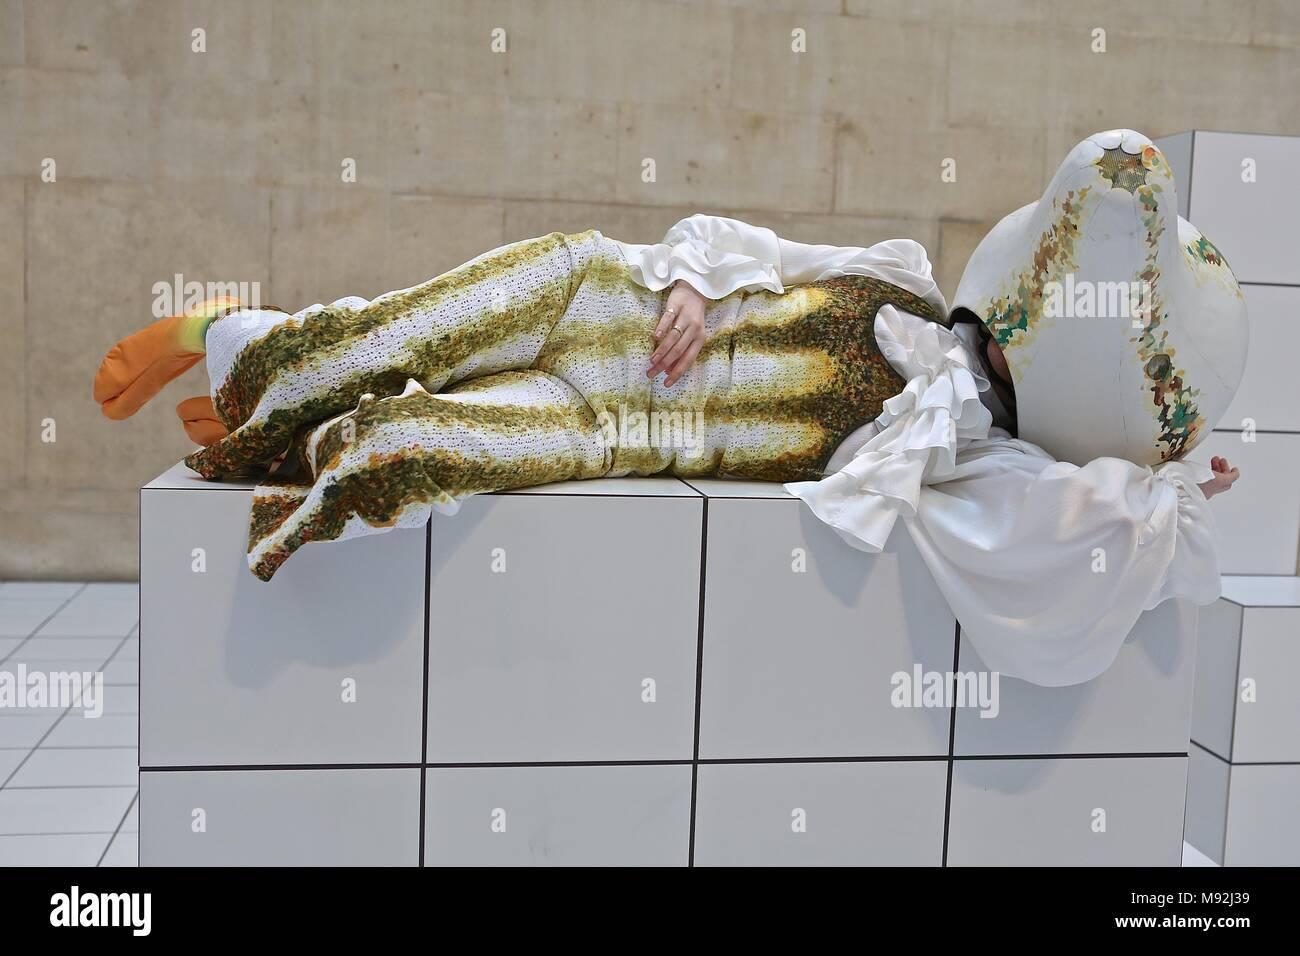 Anthea Hamilton El Squash Tate Britain 22 mar - 7 Oct 2018 Imagen De Stock